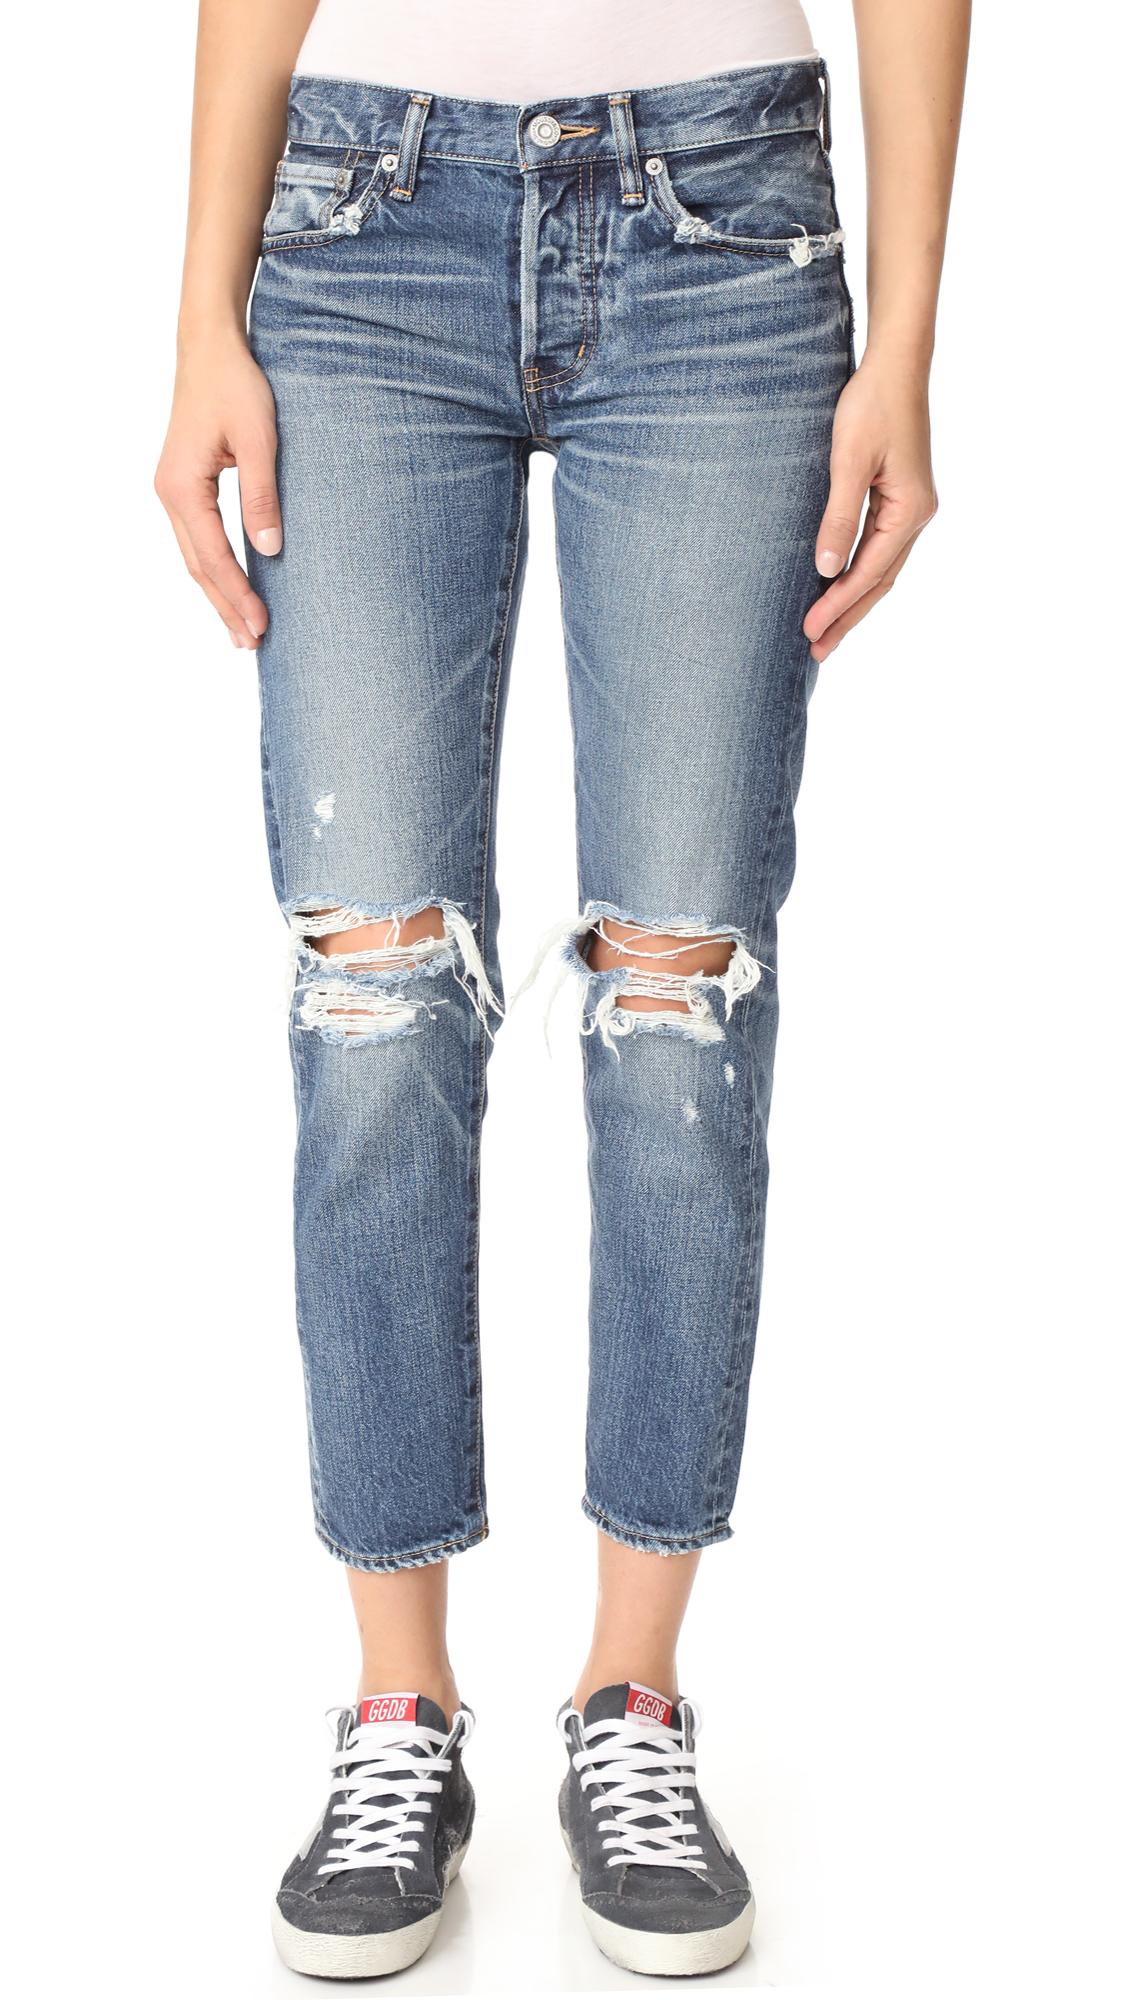 MOUSSY VINTAGE LMV Latrobe Tapered Jeans